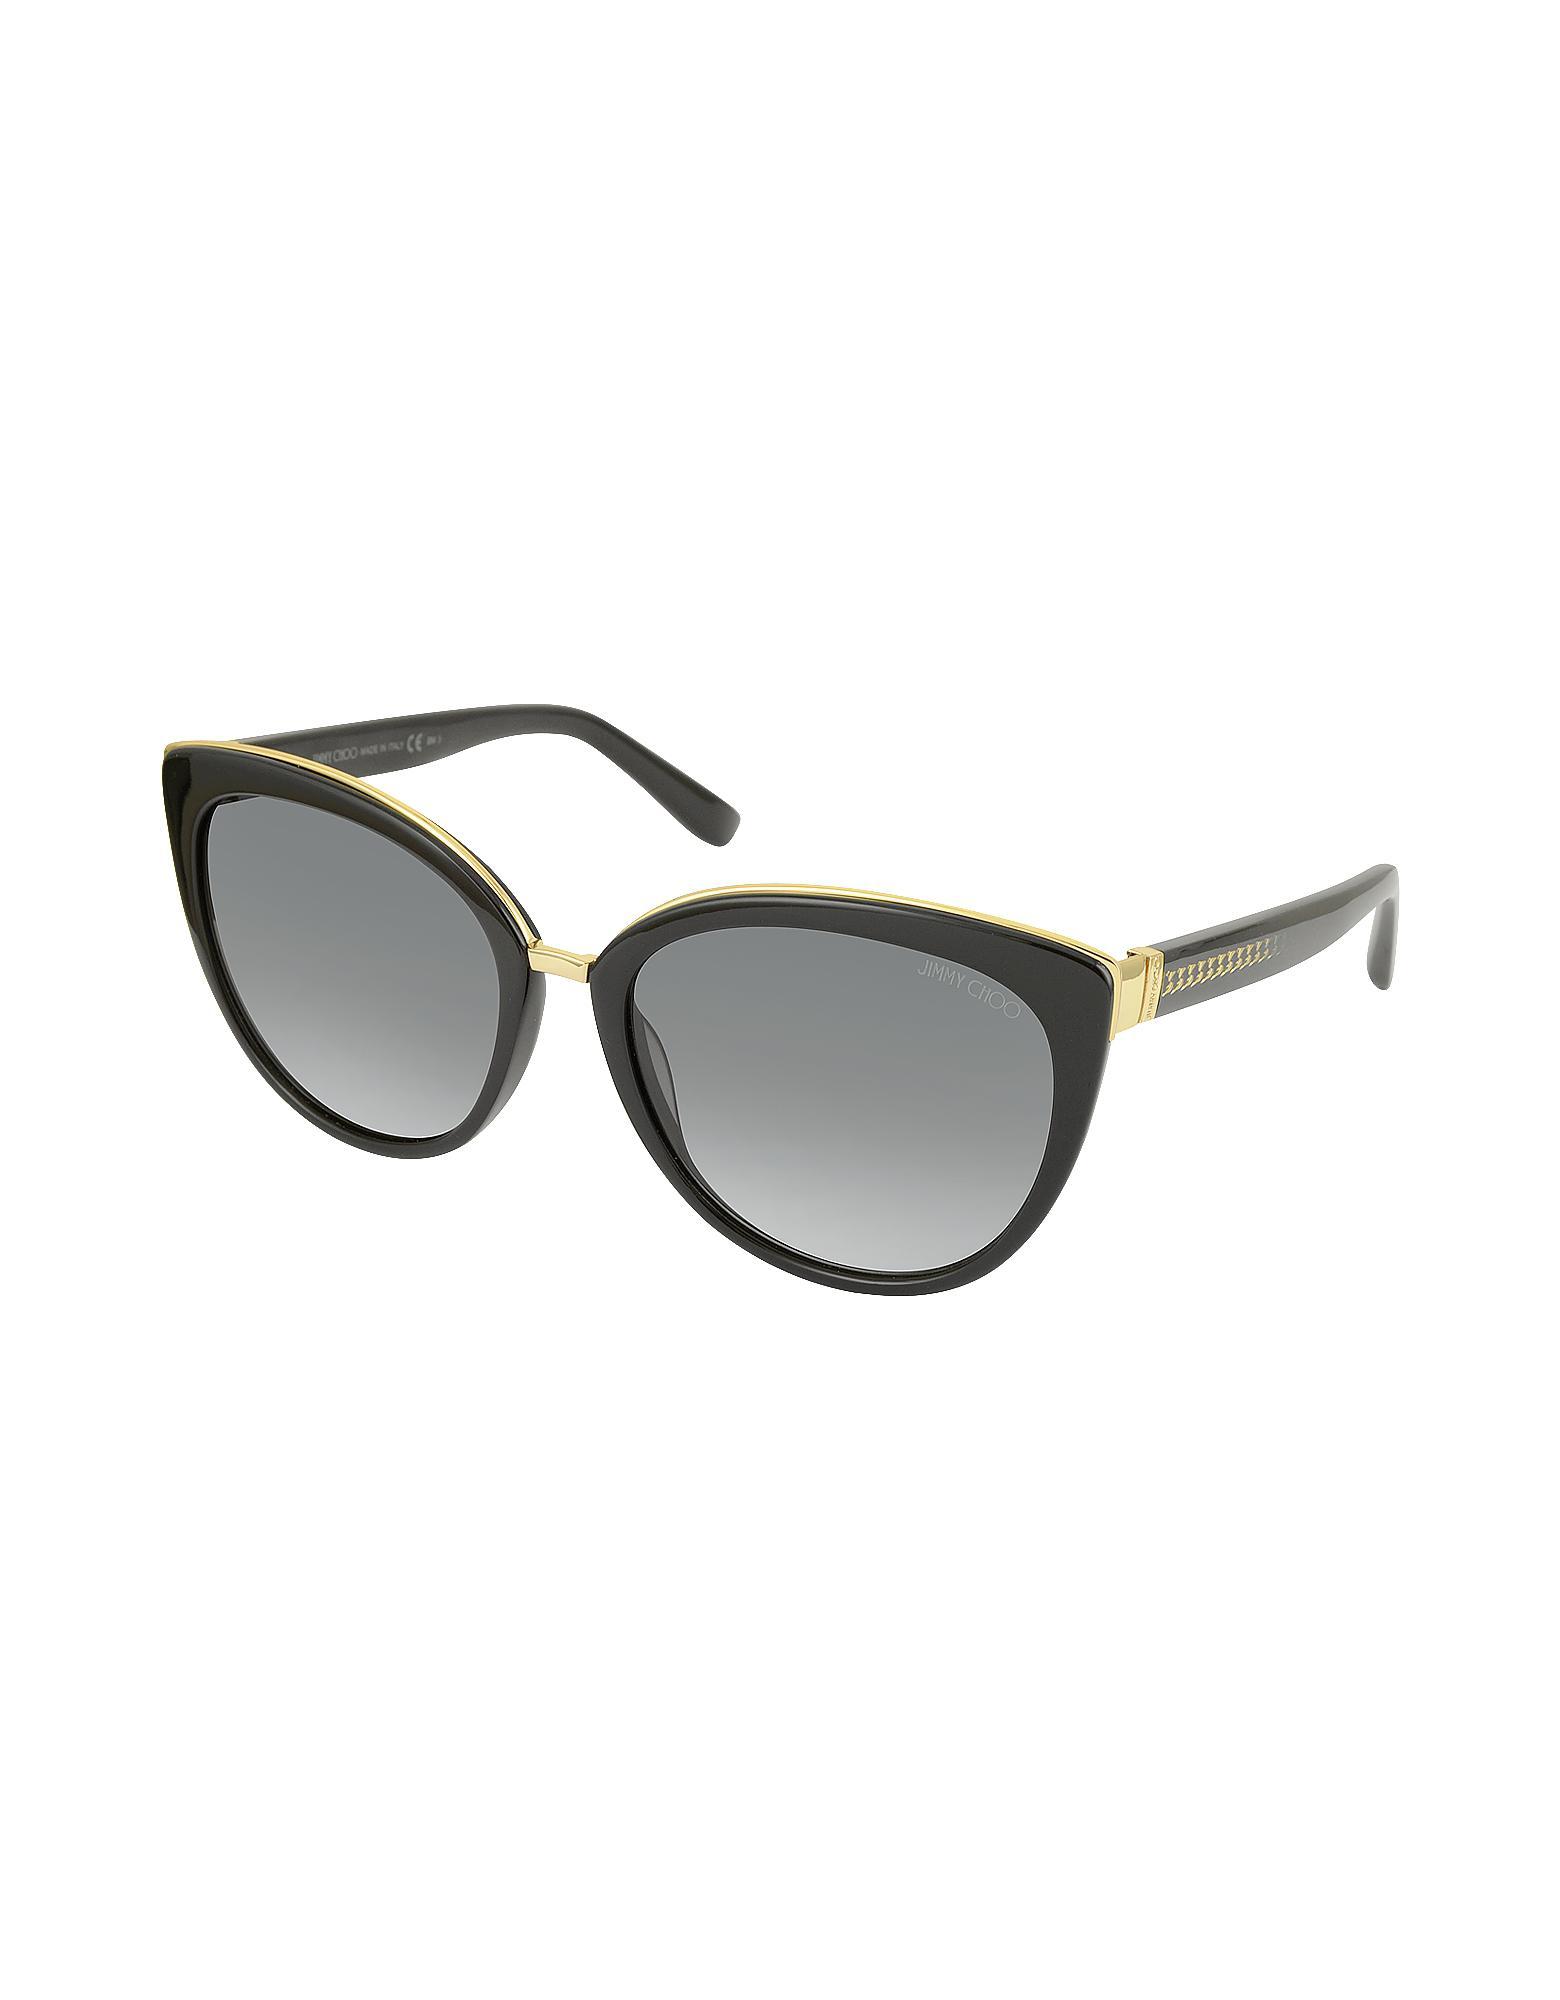 f52f6fa7633 Lyst - Jimmy Choo Dana s Acetate Cat Eye Sunglasses